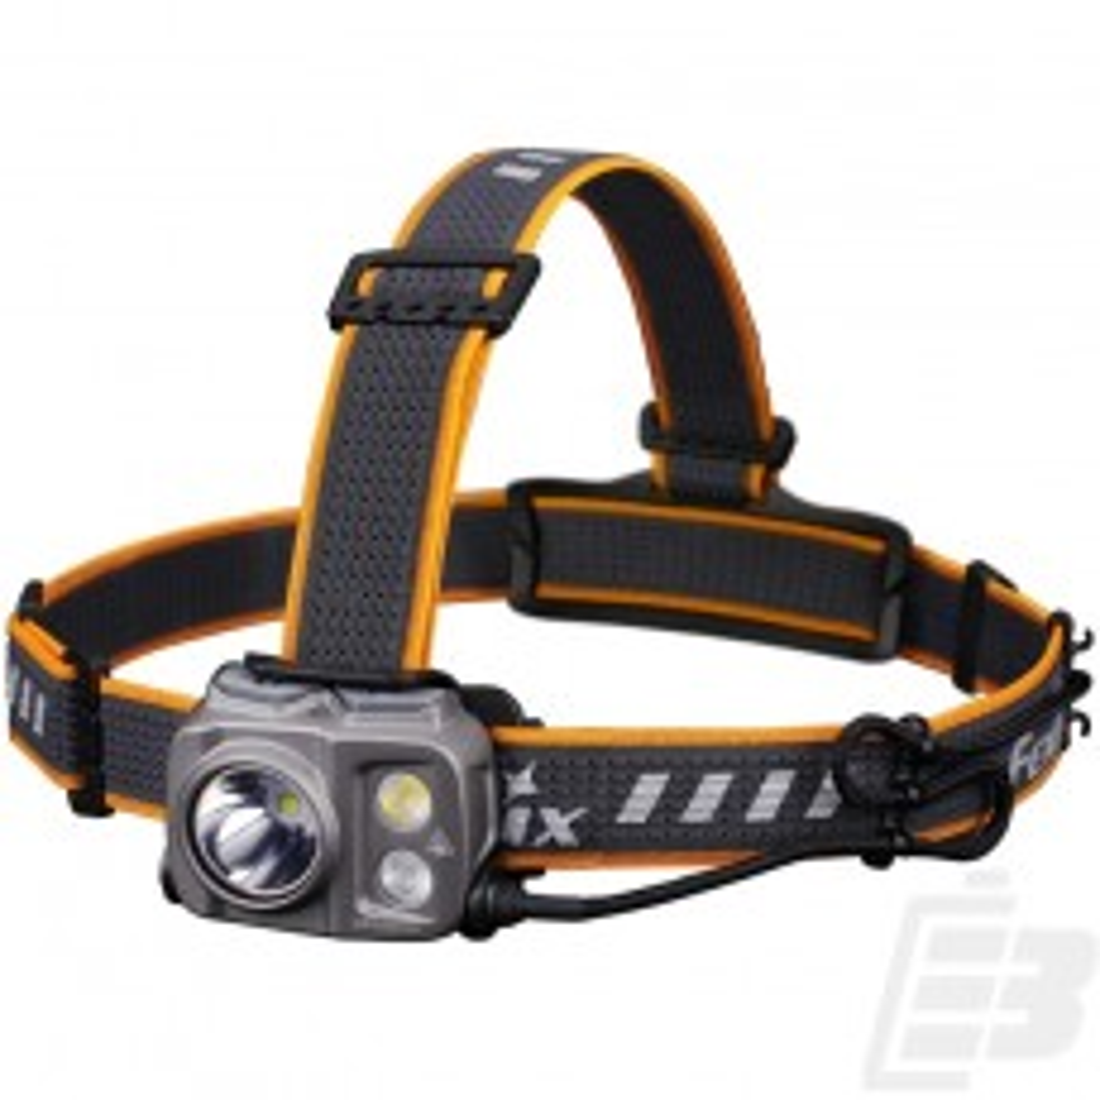 Fenix HP25R V2.0 Headlamp